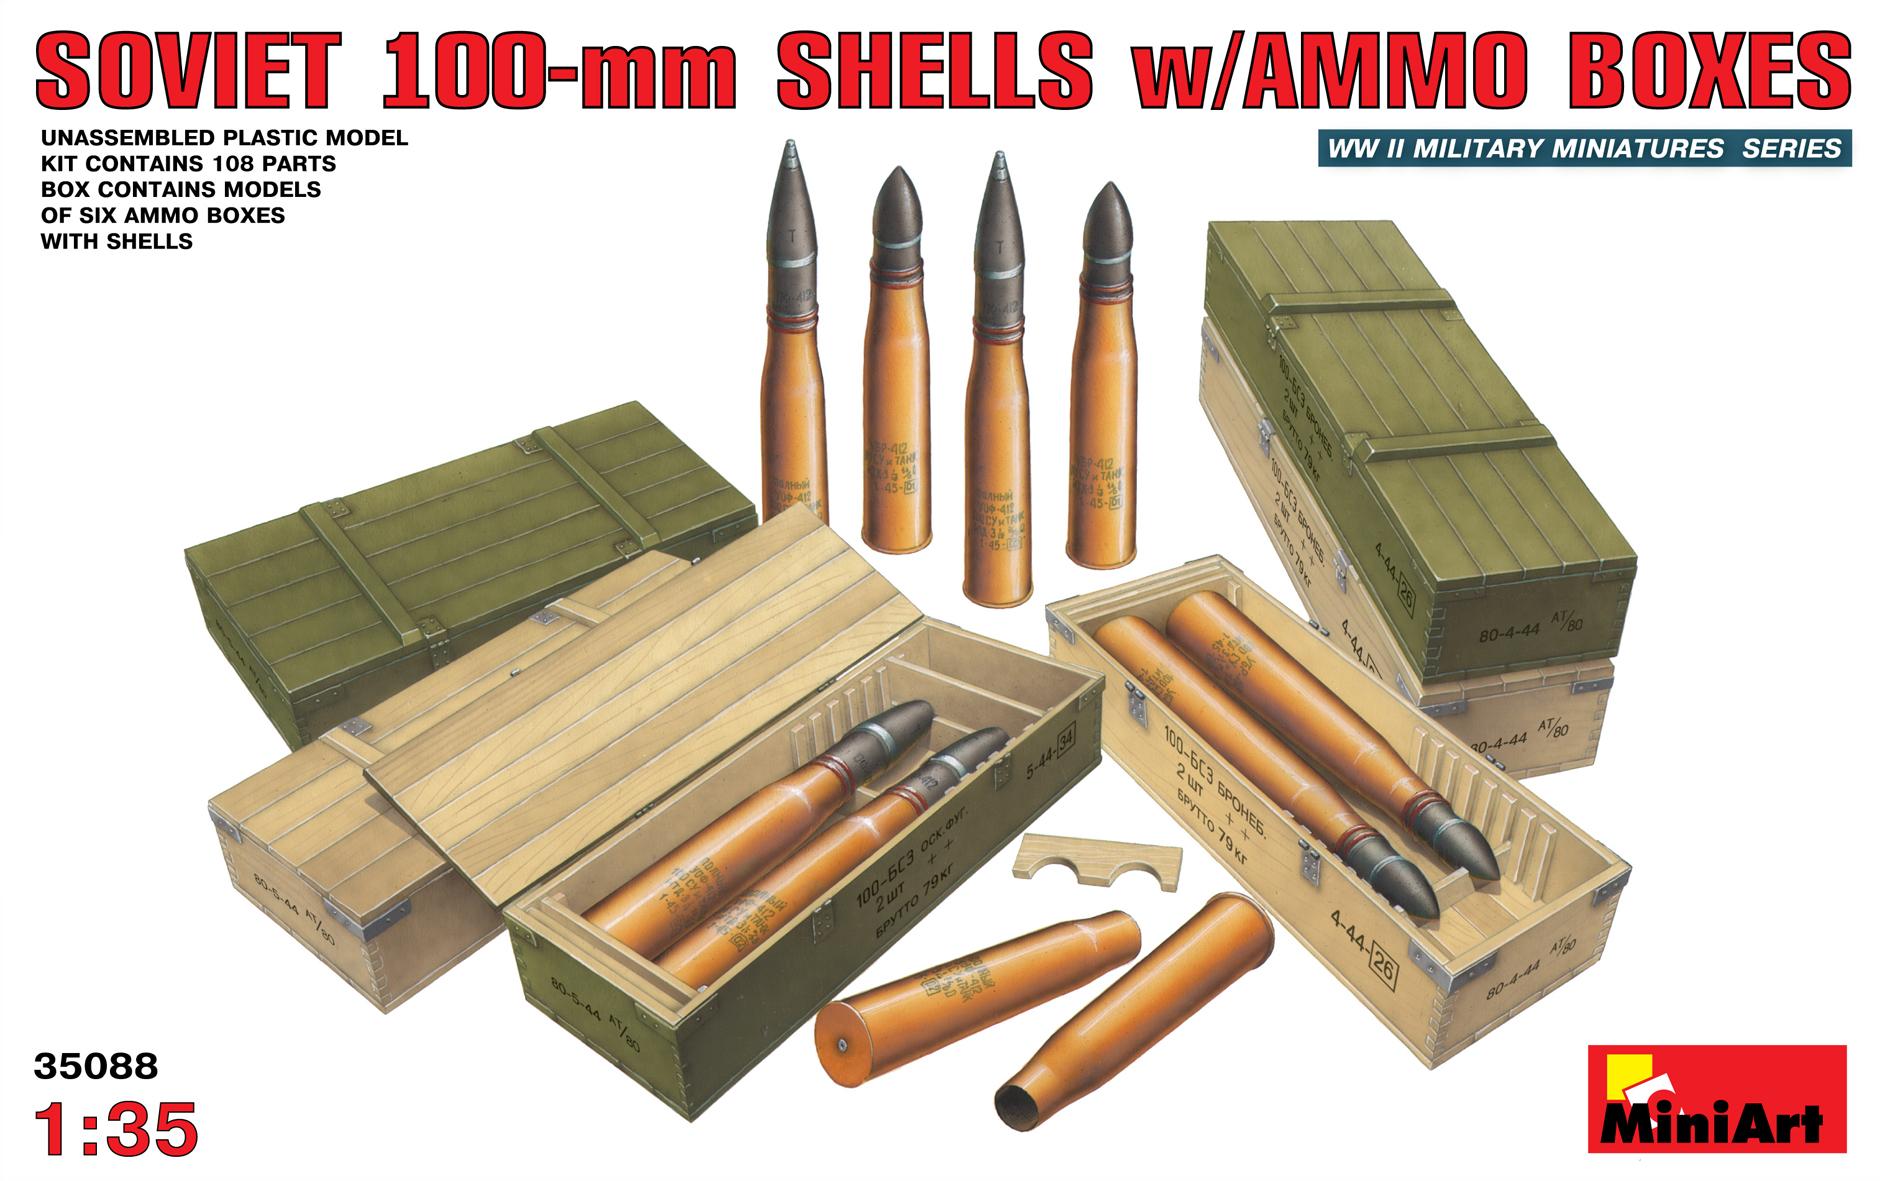 SOVIET 100-mm SHELLS w/AMMO BOXES